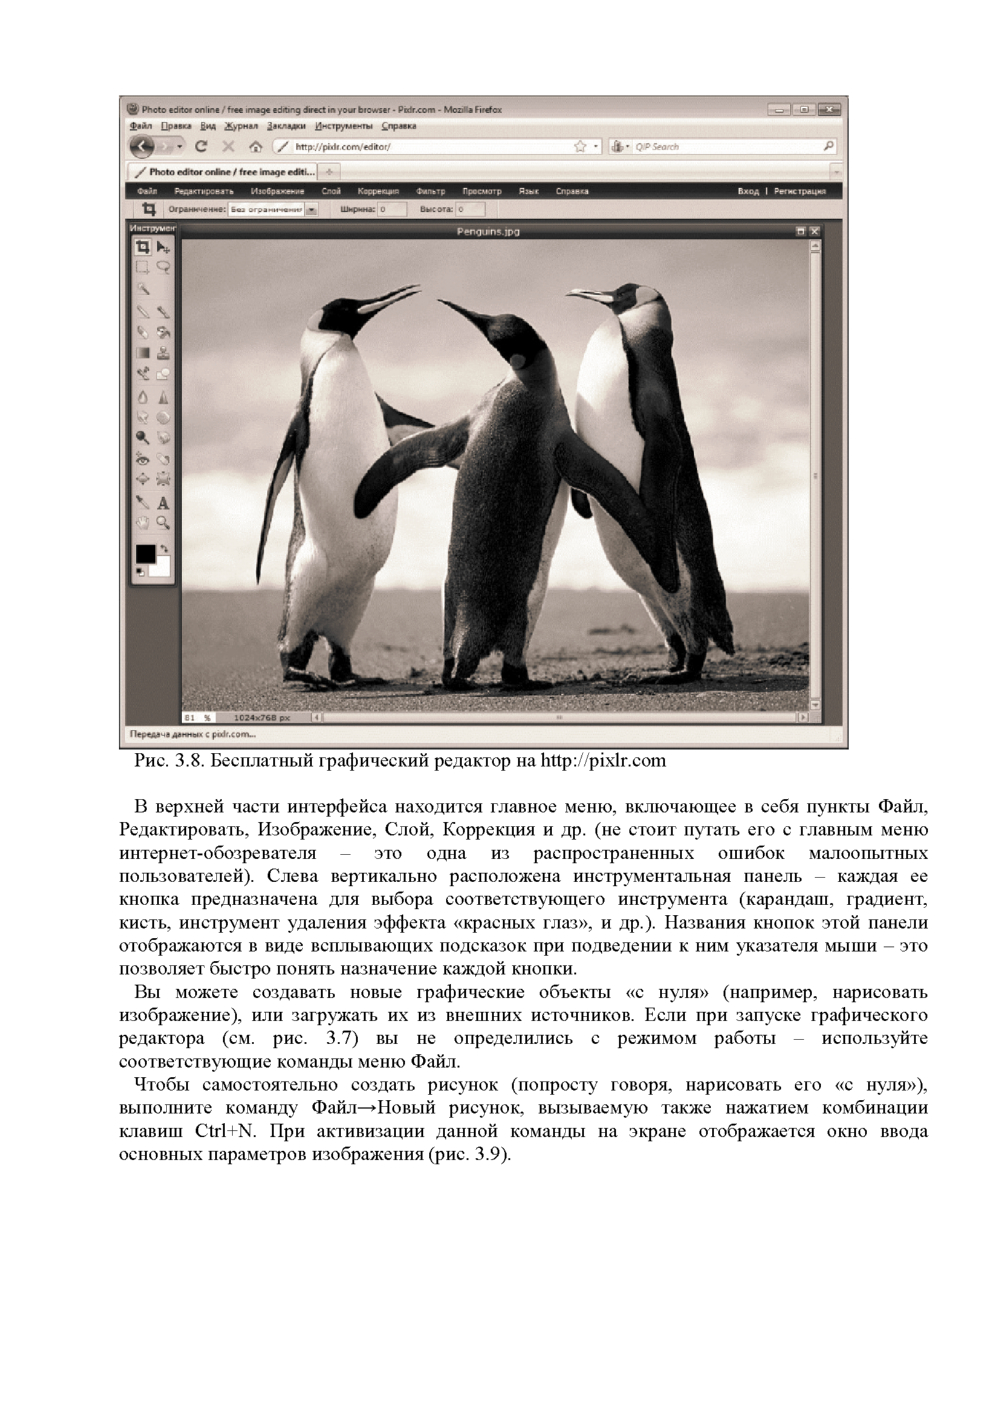 http://i2.imageban.ru/out/2013/11/11/dd54645793e6b4b9ca366c3f33f99d80.jpg